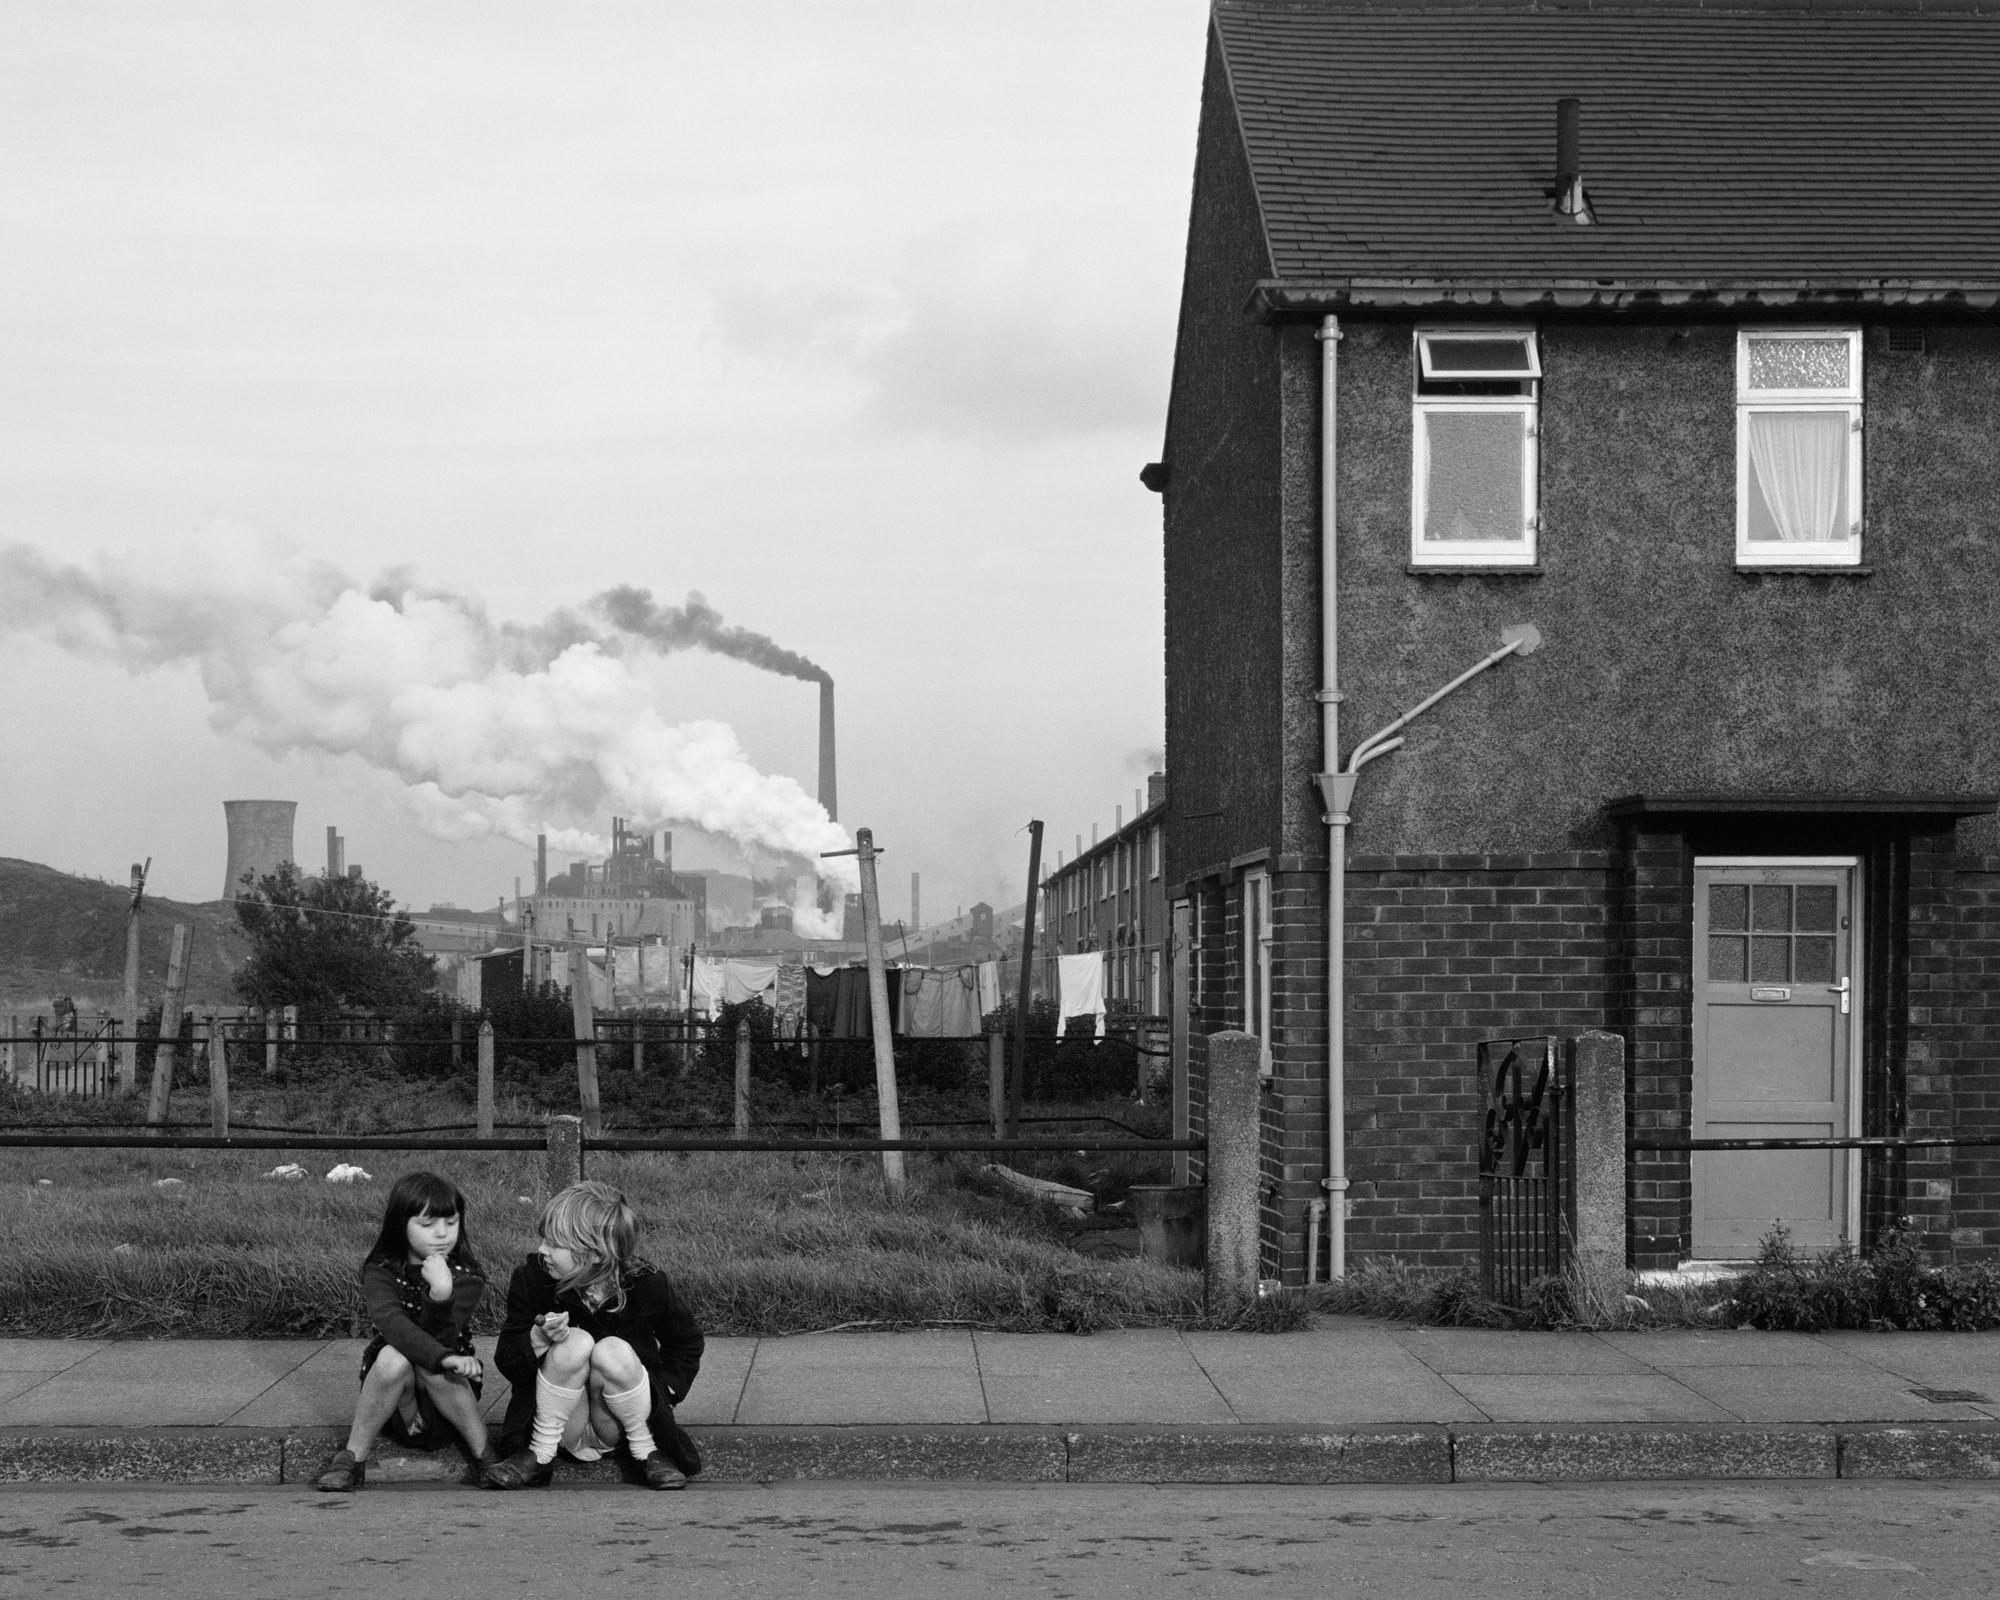 Grangetown, Middlesbrough, 1976. © Chris Killip (J. Paul Getty Museum)